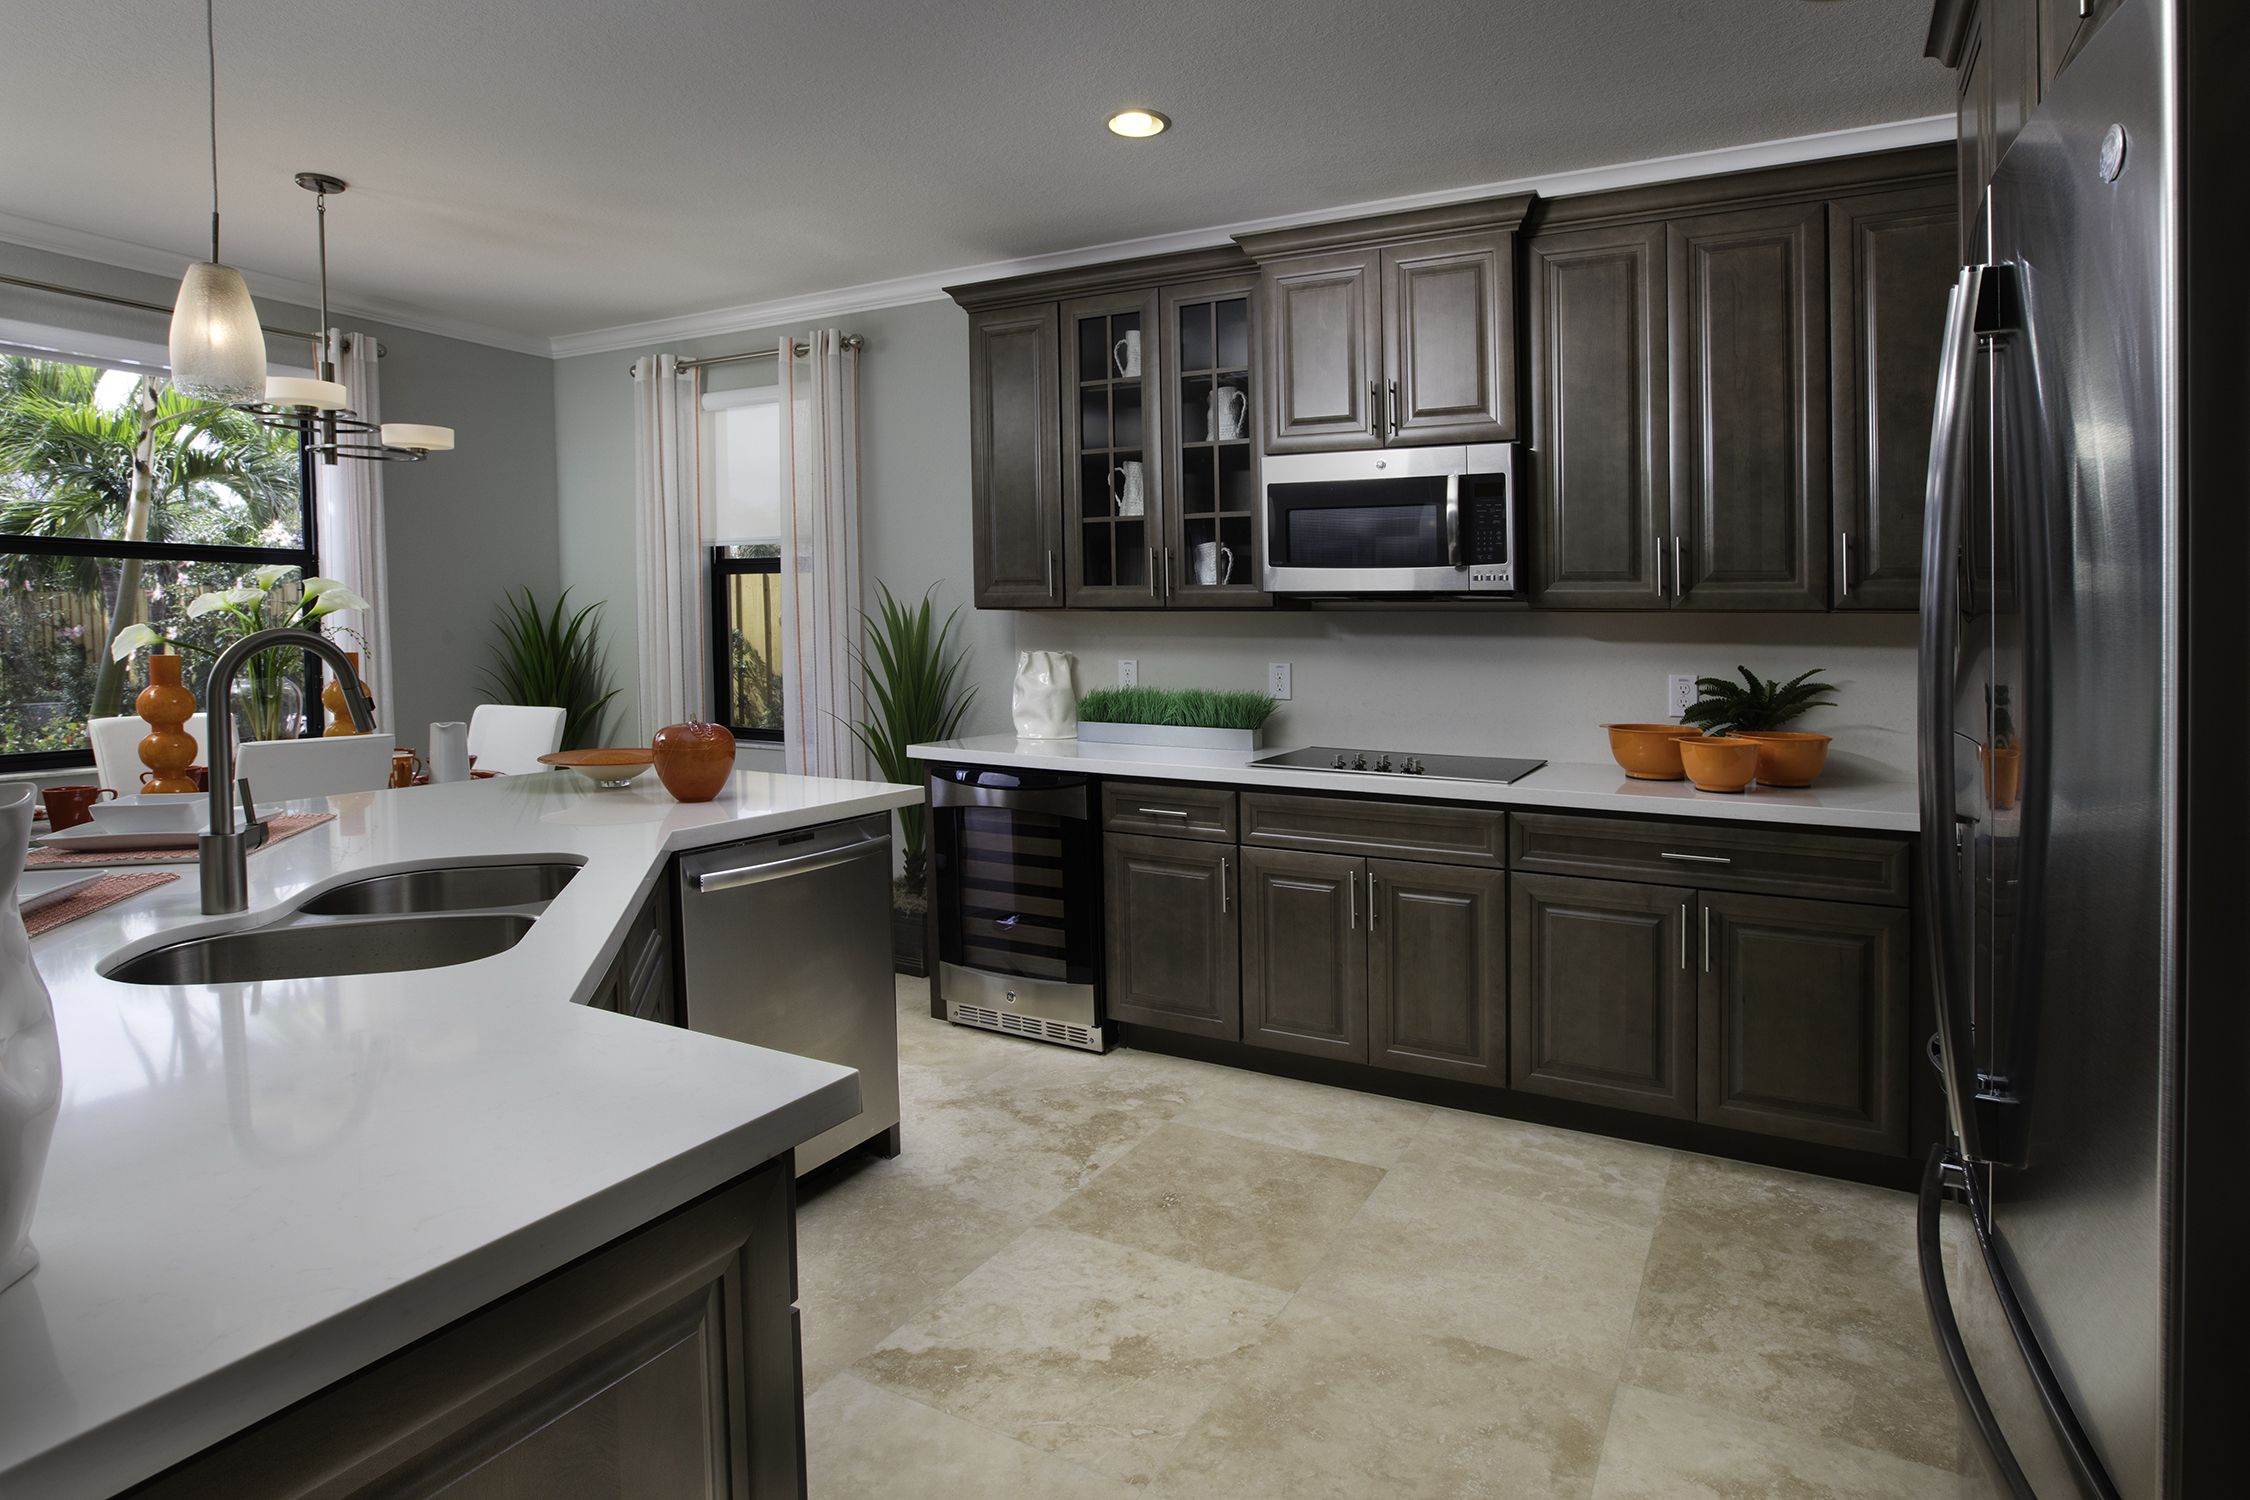 Madison Pointe | The Apollo | Dream Kitchen | Dark Cabinets | Luxury Homes  | Doral, FL | Lennar | Lennar DREAM Kitchens | Pinterest | Kitchens, Kitchen  Cost ...